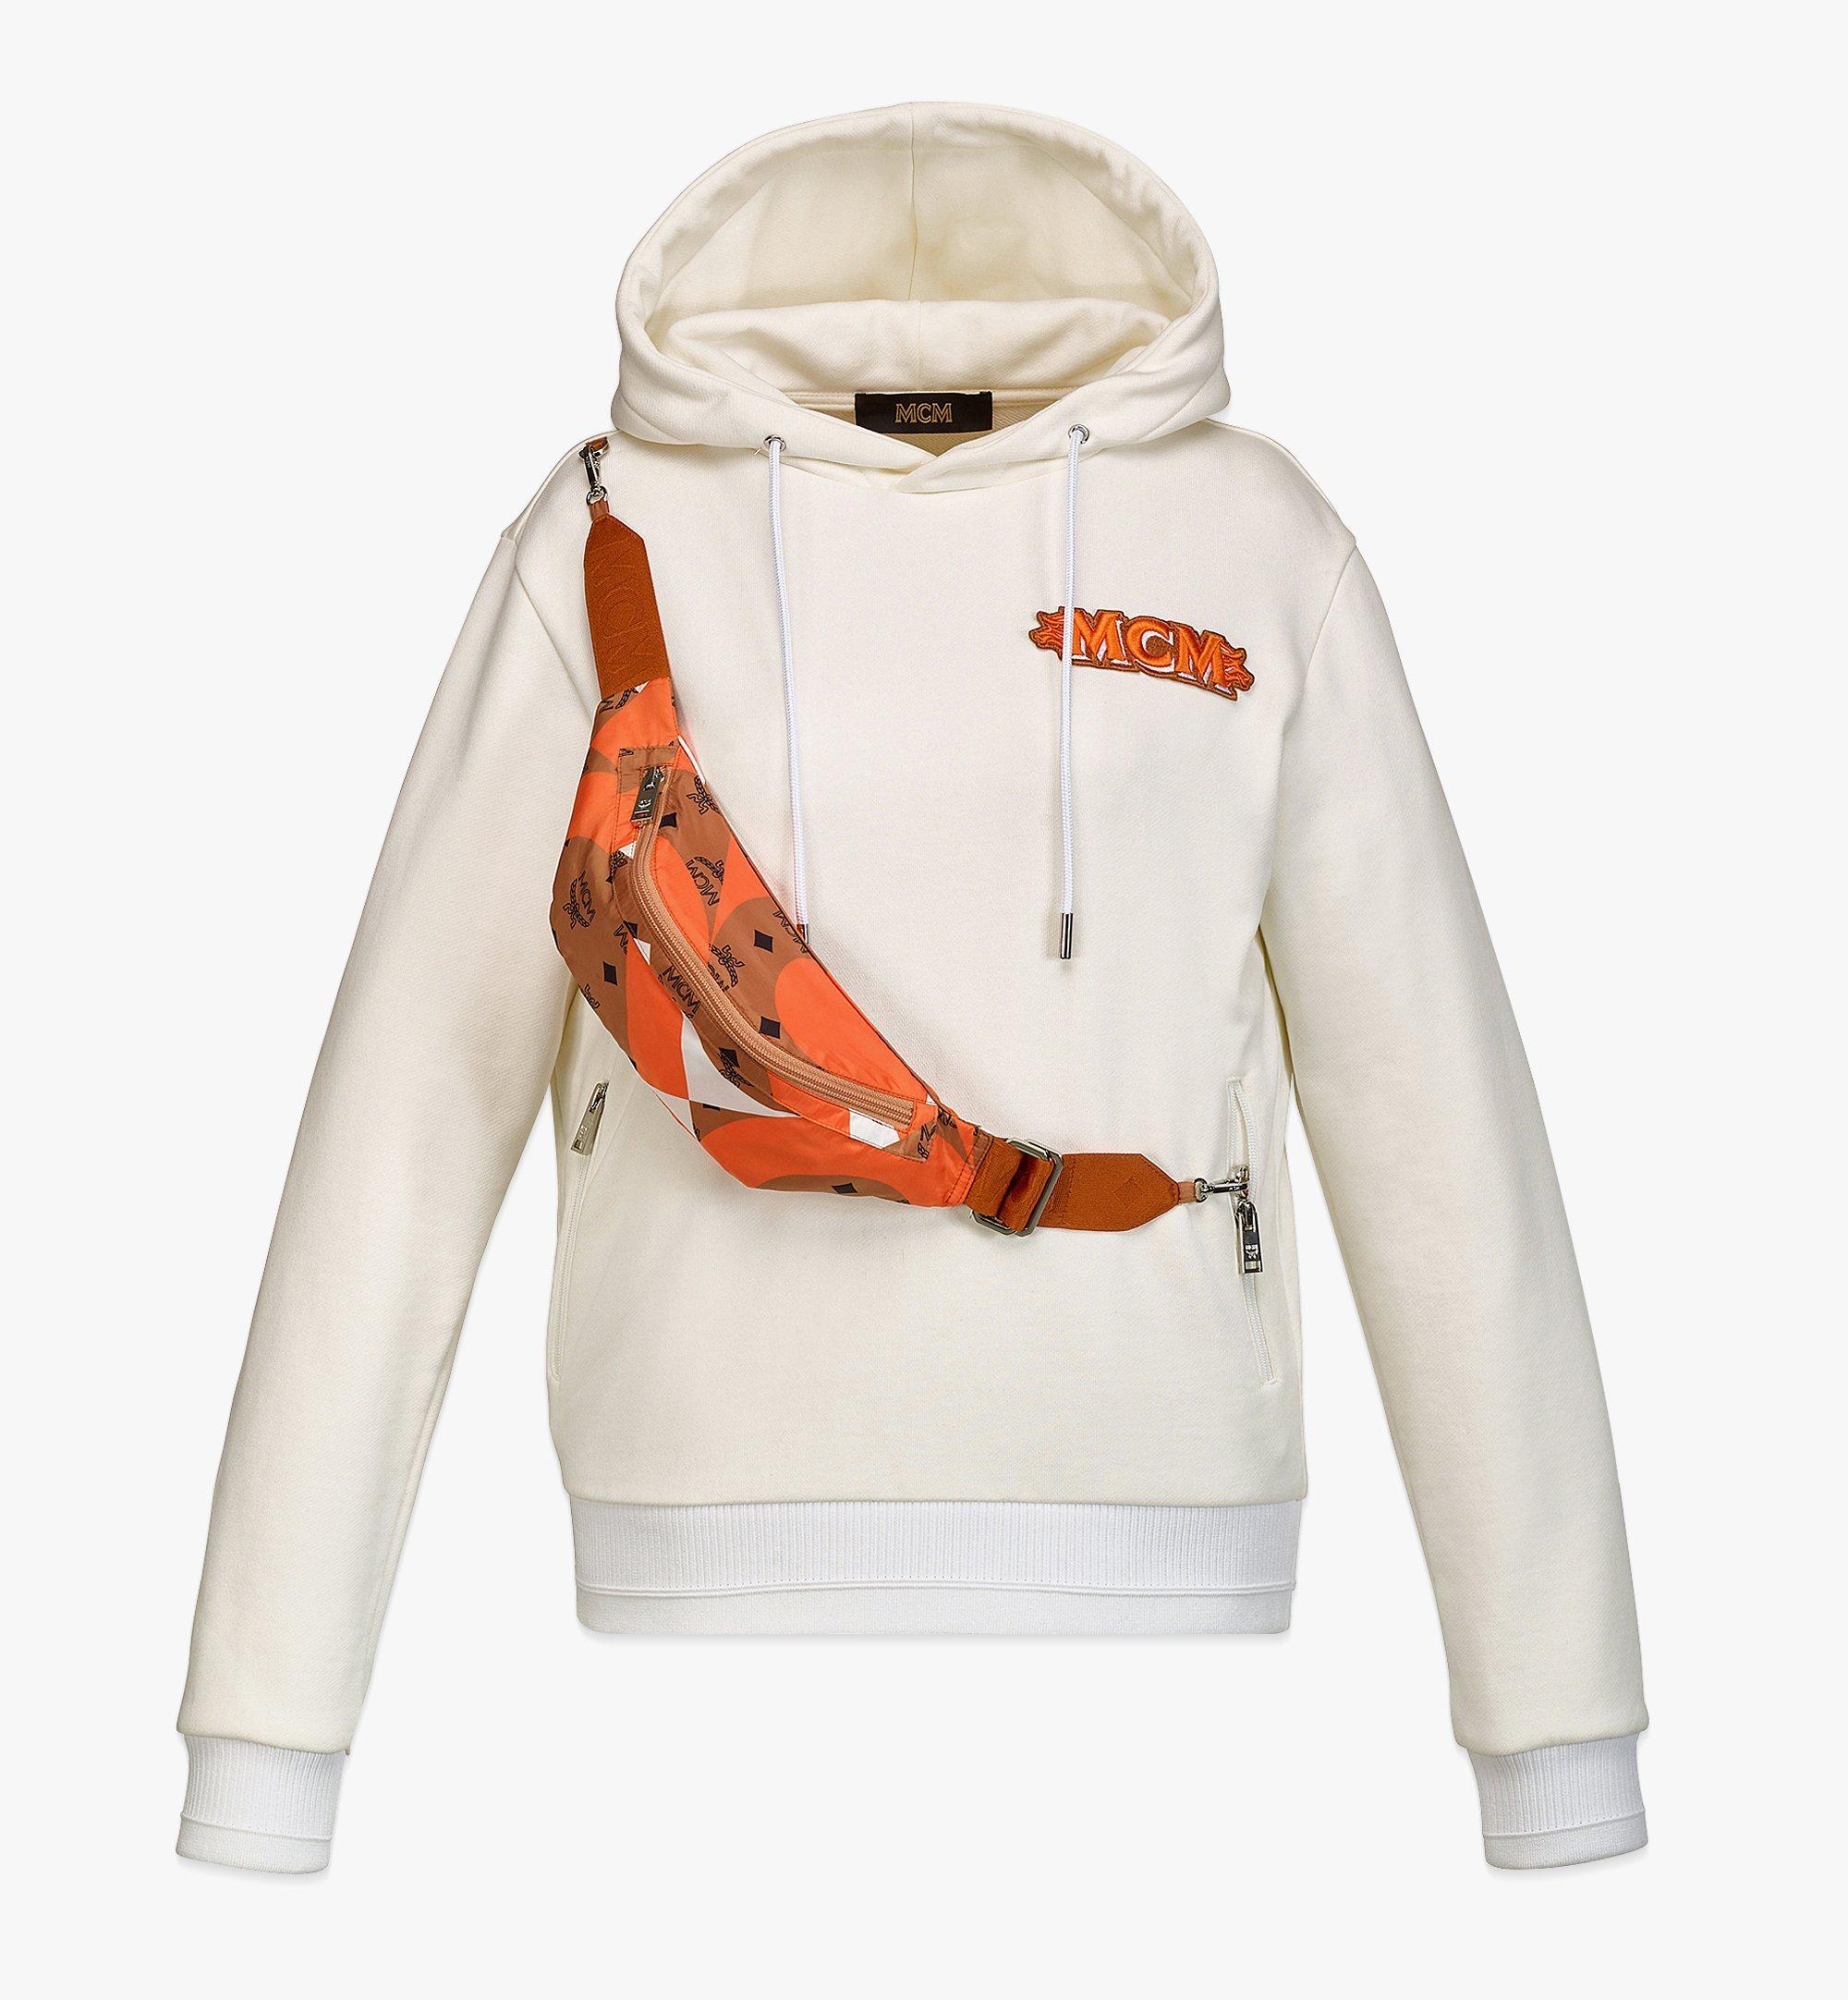 MCM ウィメンズ ロゴ フーディー バウハウス ヴィセトス ベルトバッグ付き Orange MFABASX02O900L ほかの角度から見る 1